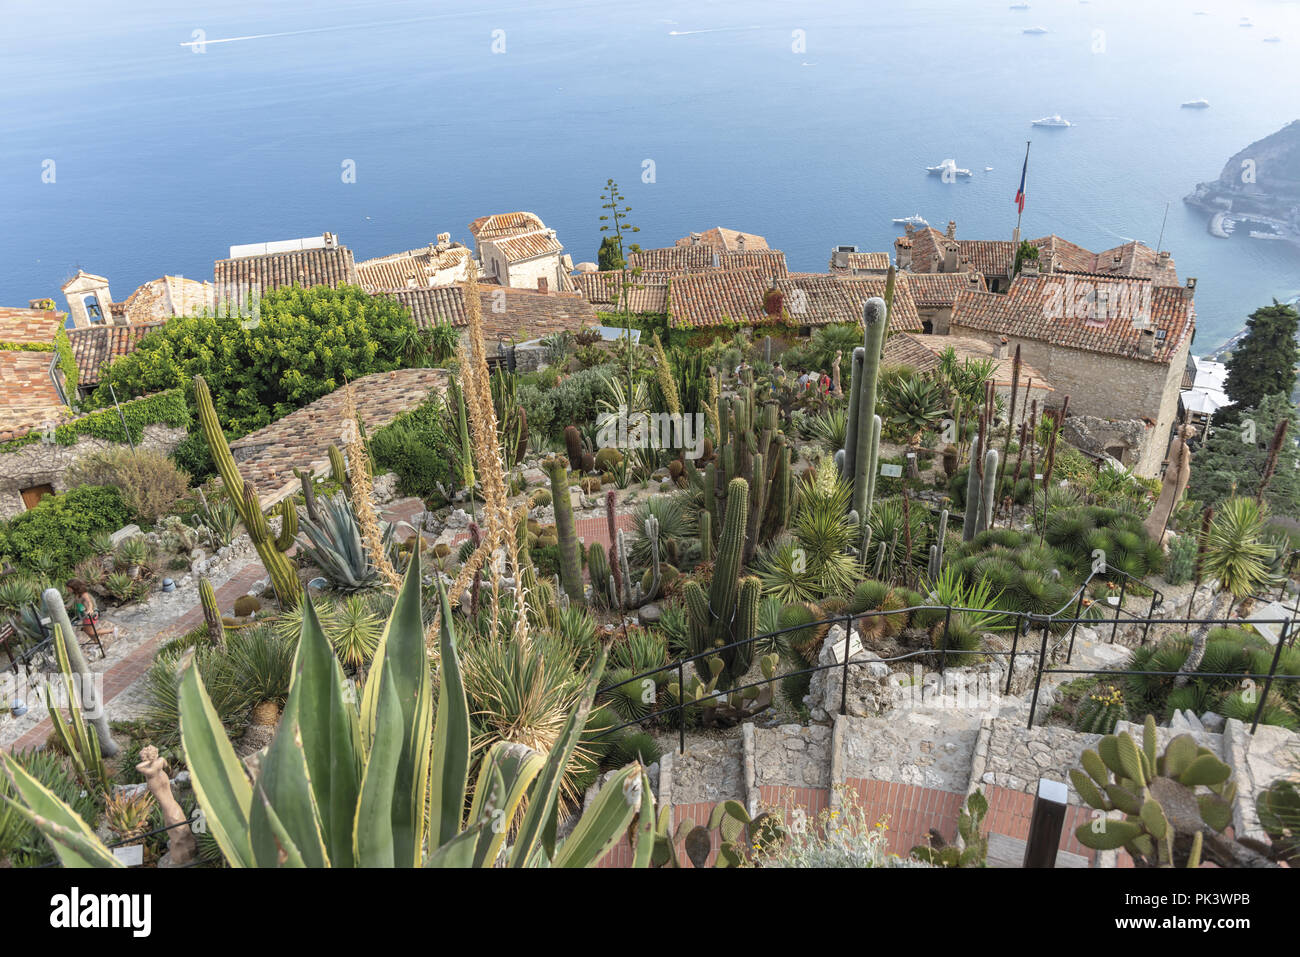 Francia Nizza Eze Città medievale giardino botanico succulente 9 - Stock Image